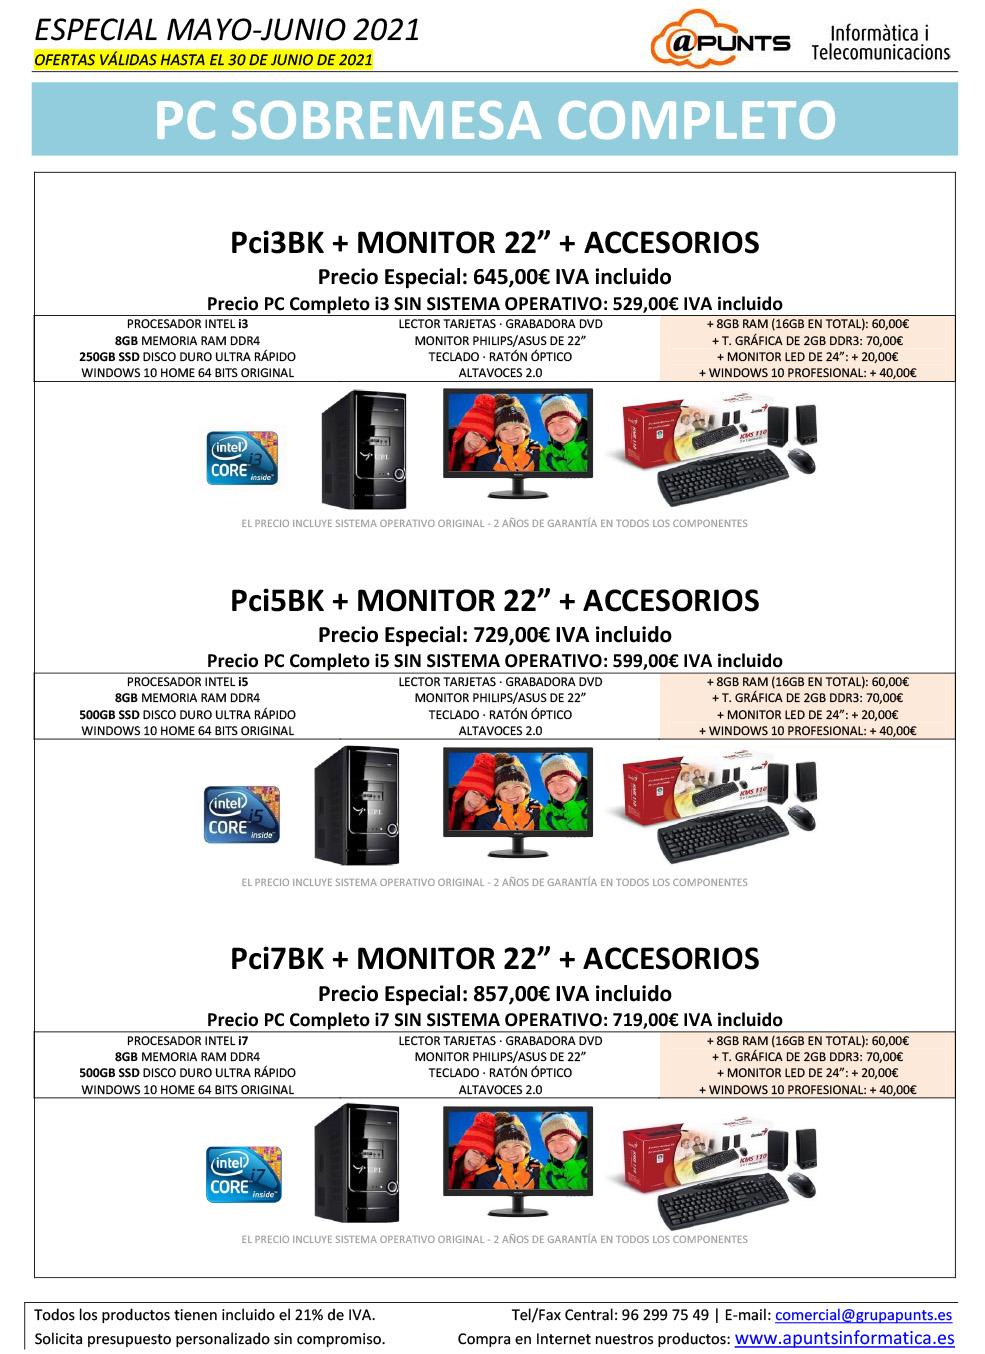 ofertas-portatiles-ordenadores-mayo2021-3